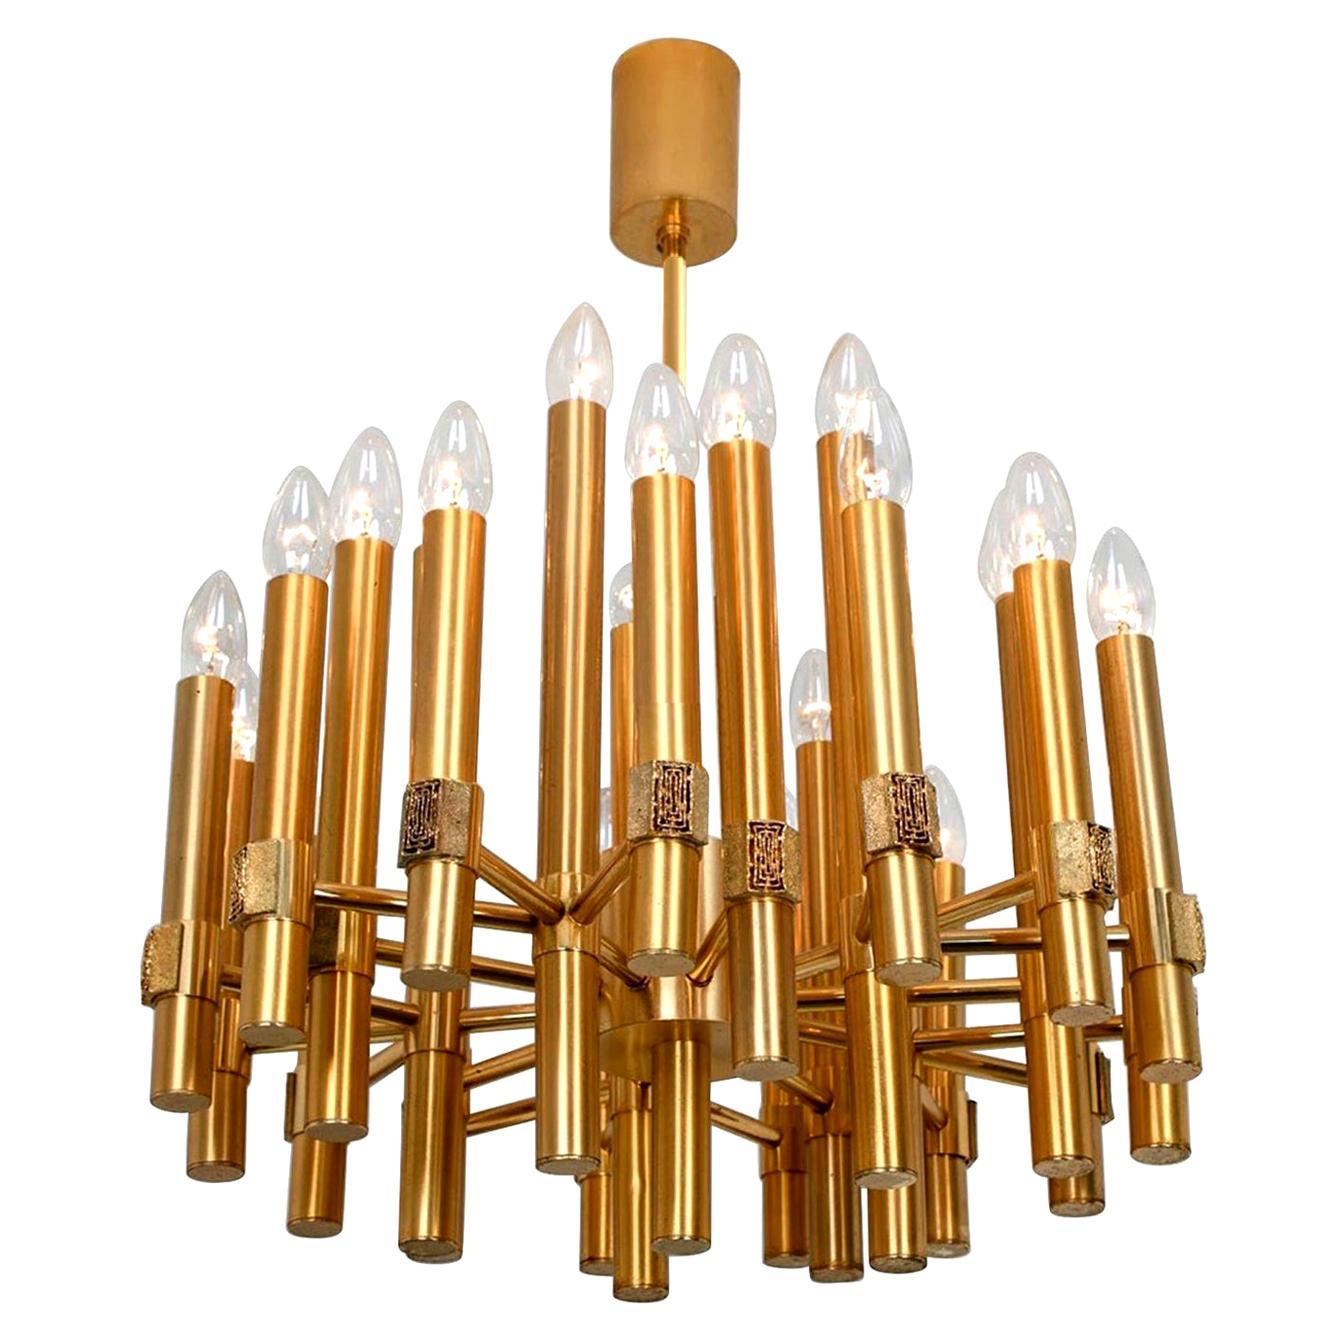 Large Brass Chandelier or Sputnik by Angelo Brotto for Esperia Italia